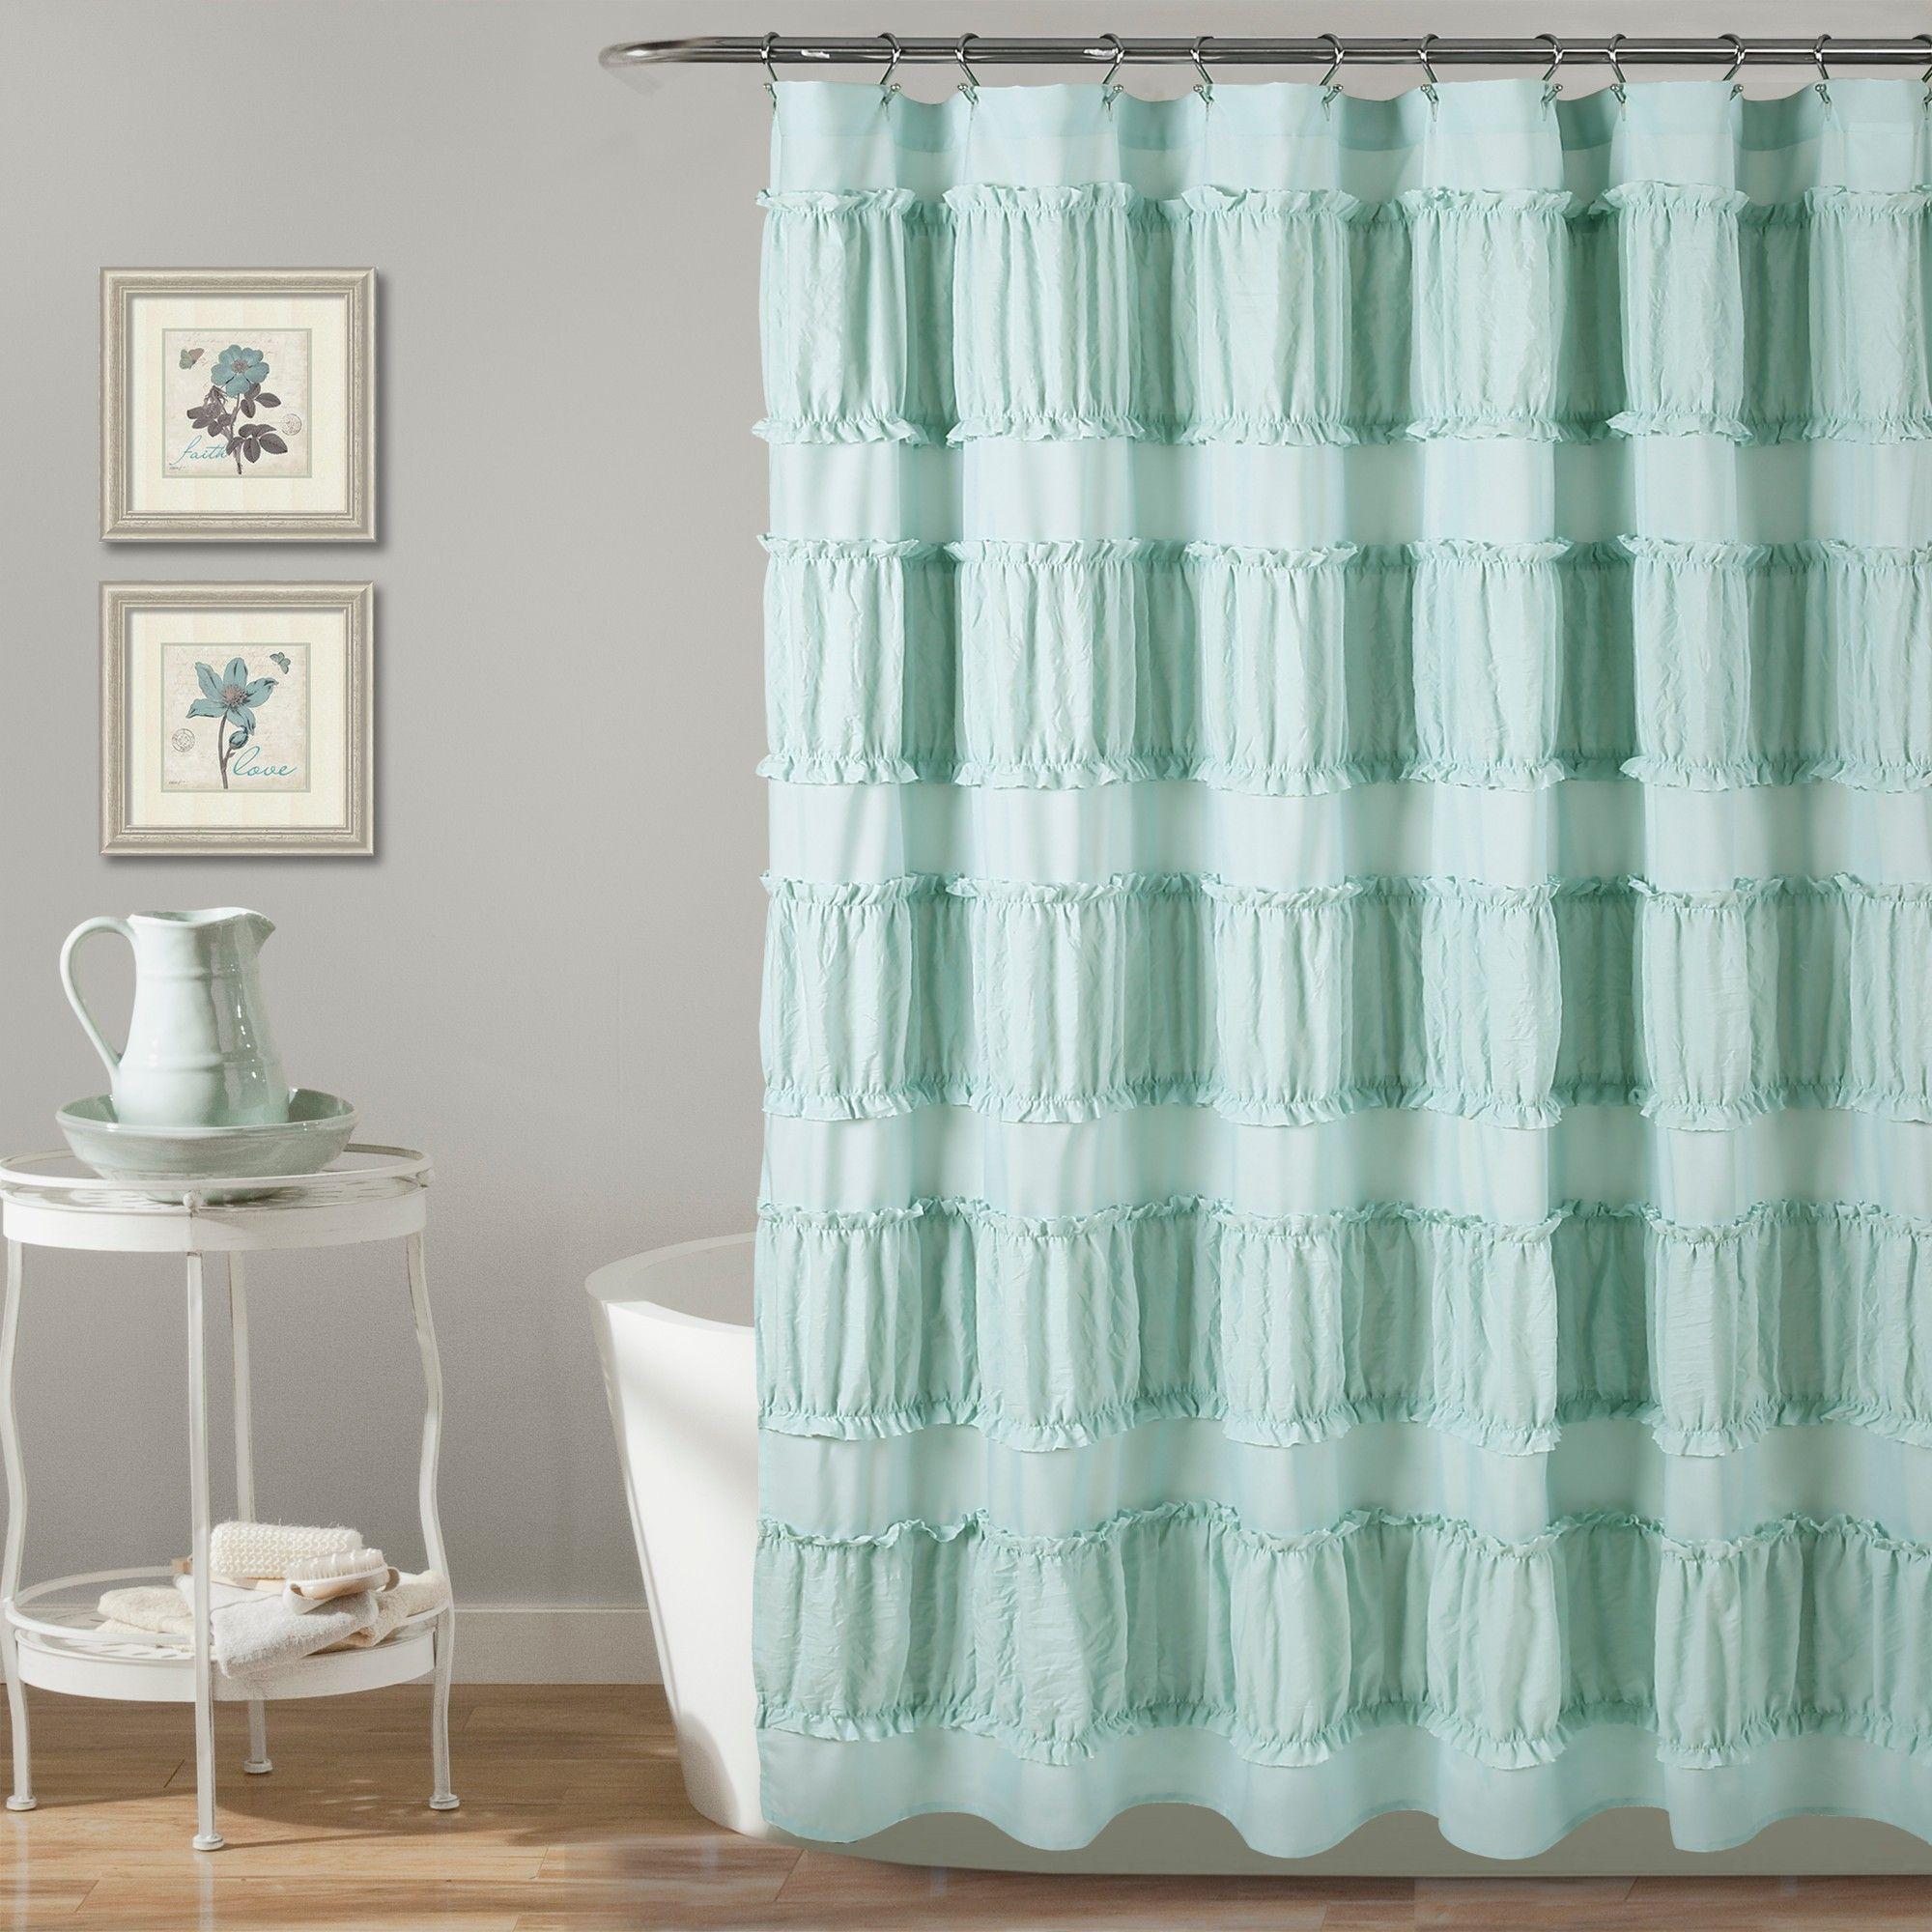 Nova Ruffle Shower Curtain Blue Lush Decor Adult Unisex